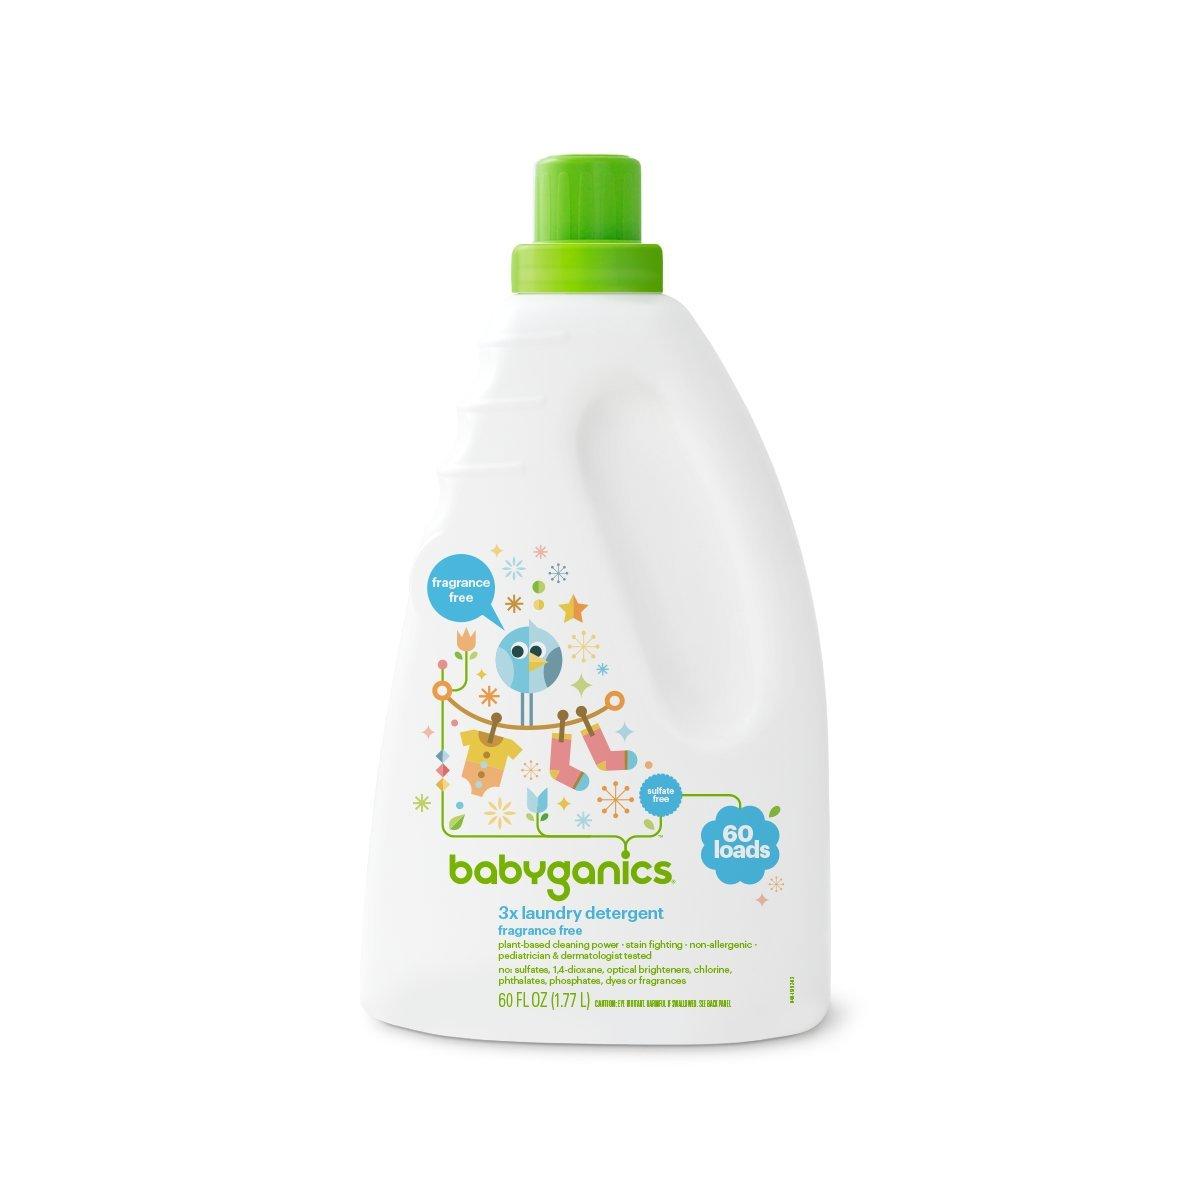 Babyganics 3X Baby Laundry Detergent, Fragrance Free, 60 Fluid Ounce by Babyganics